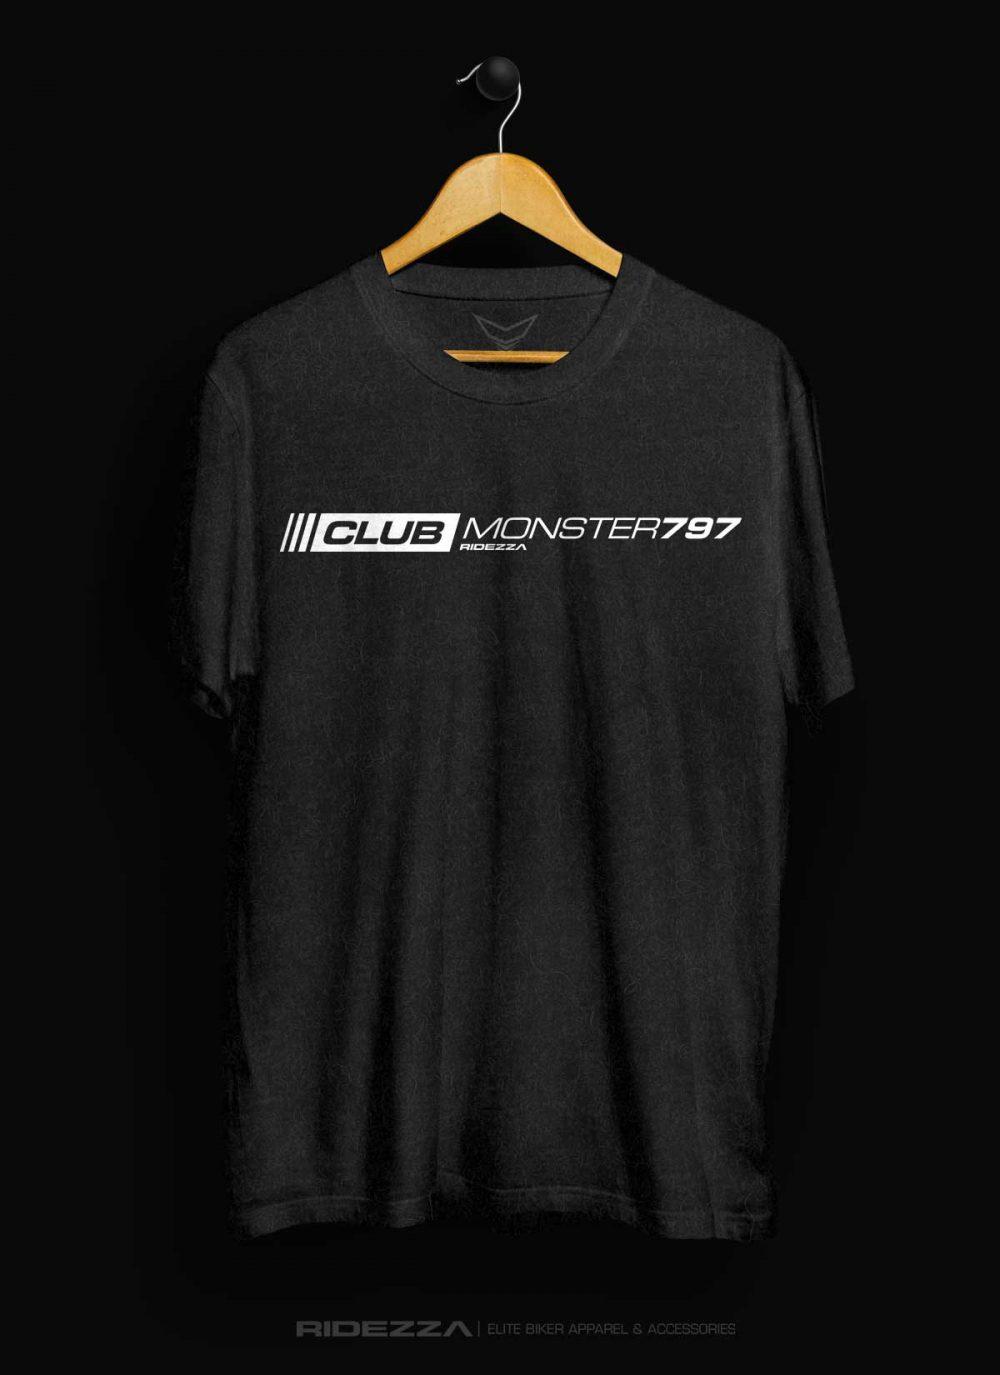 Ducati Monster 797 Club T-Shirt